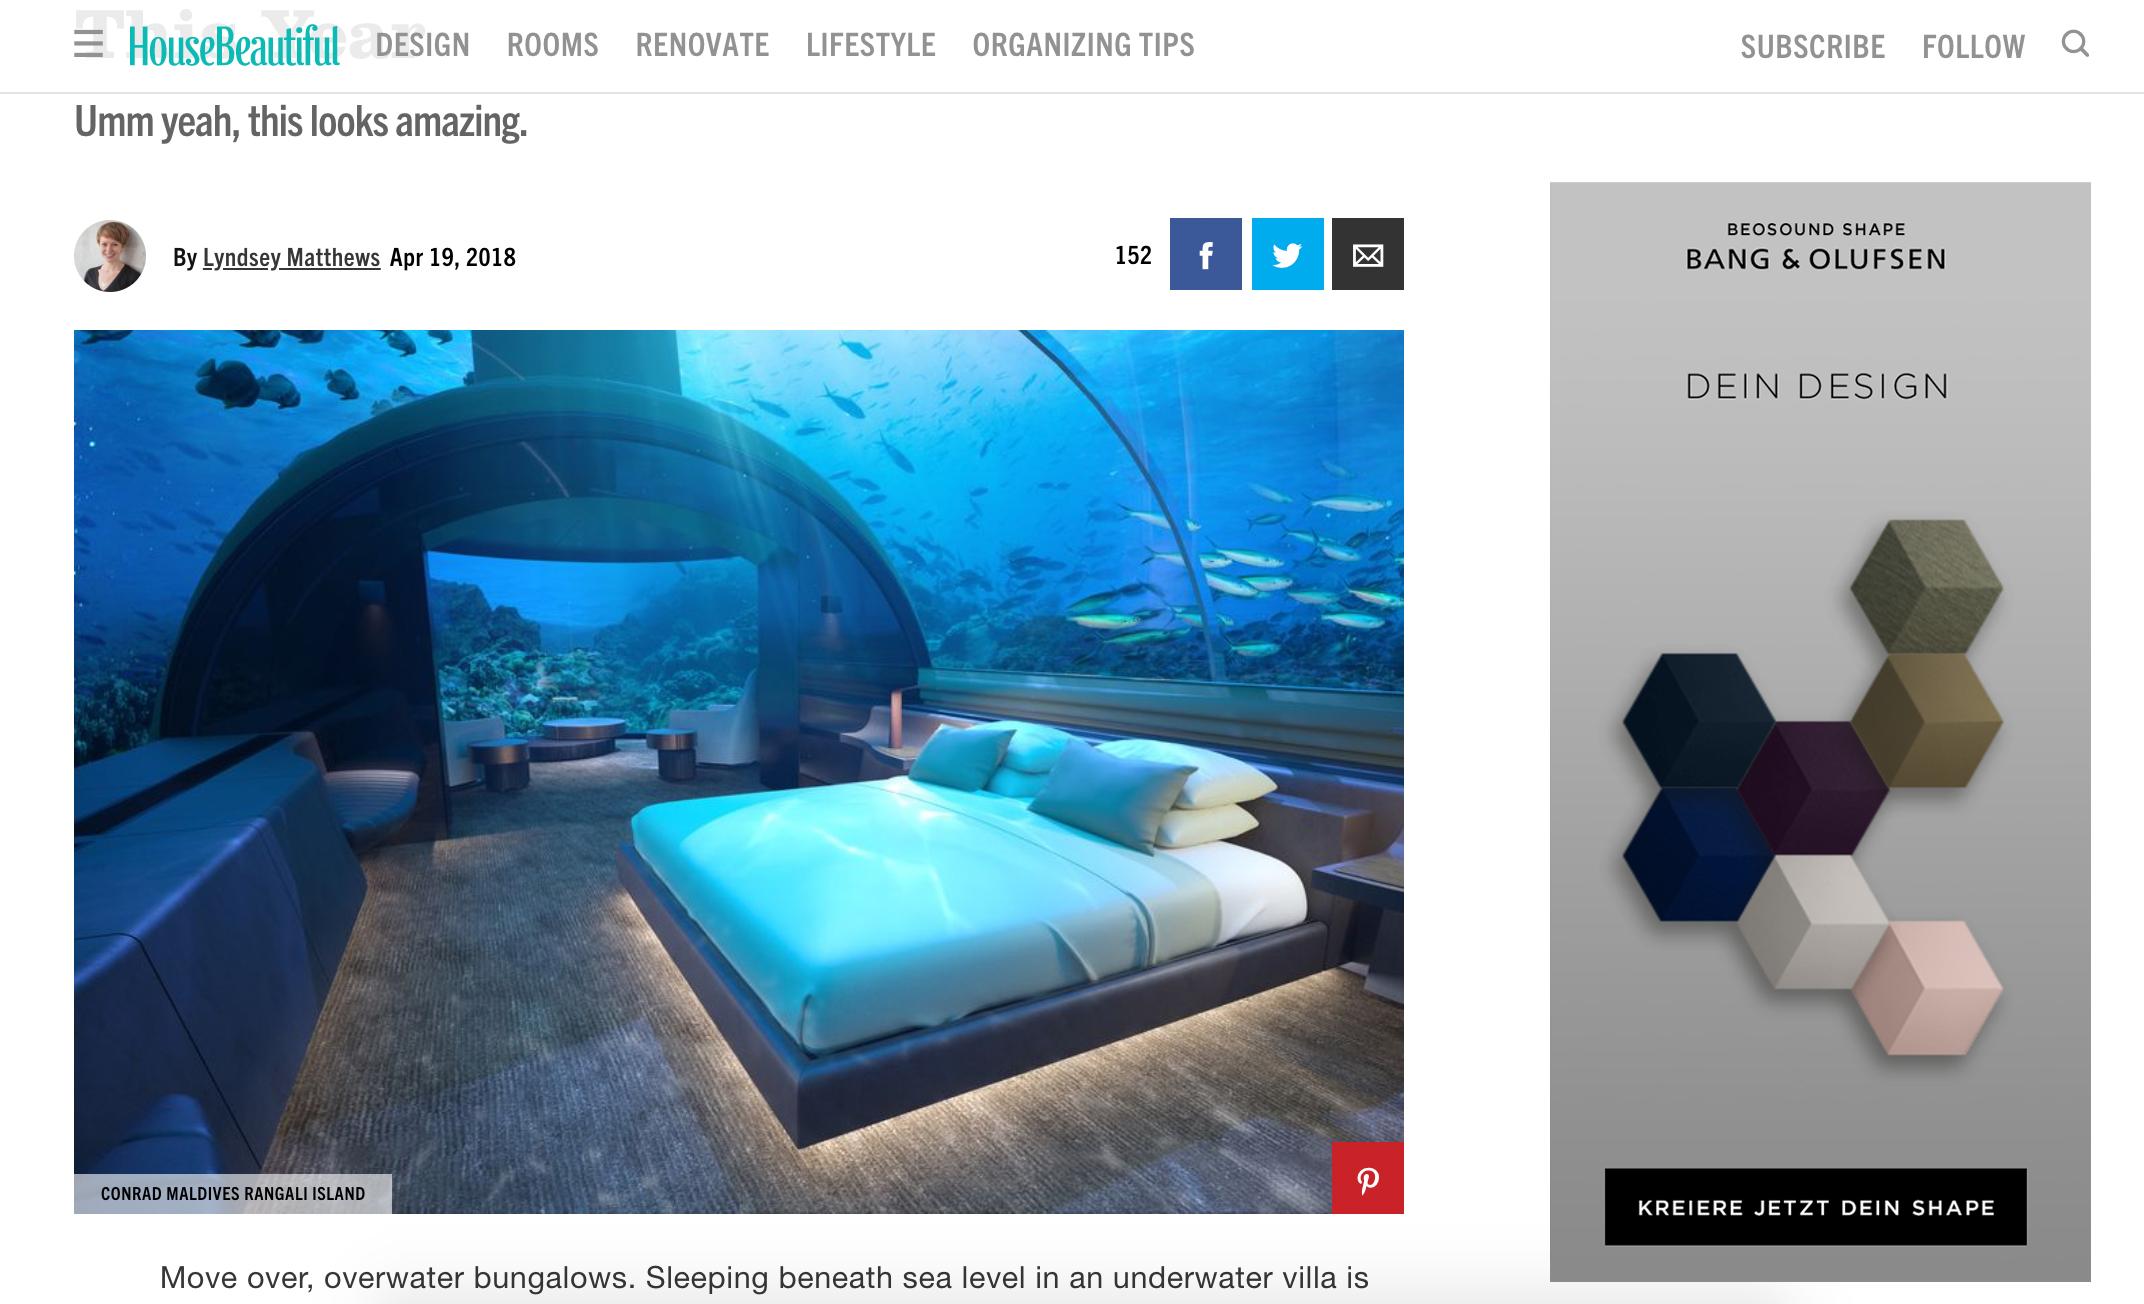 housebeautiful.com.jpg